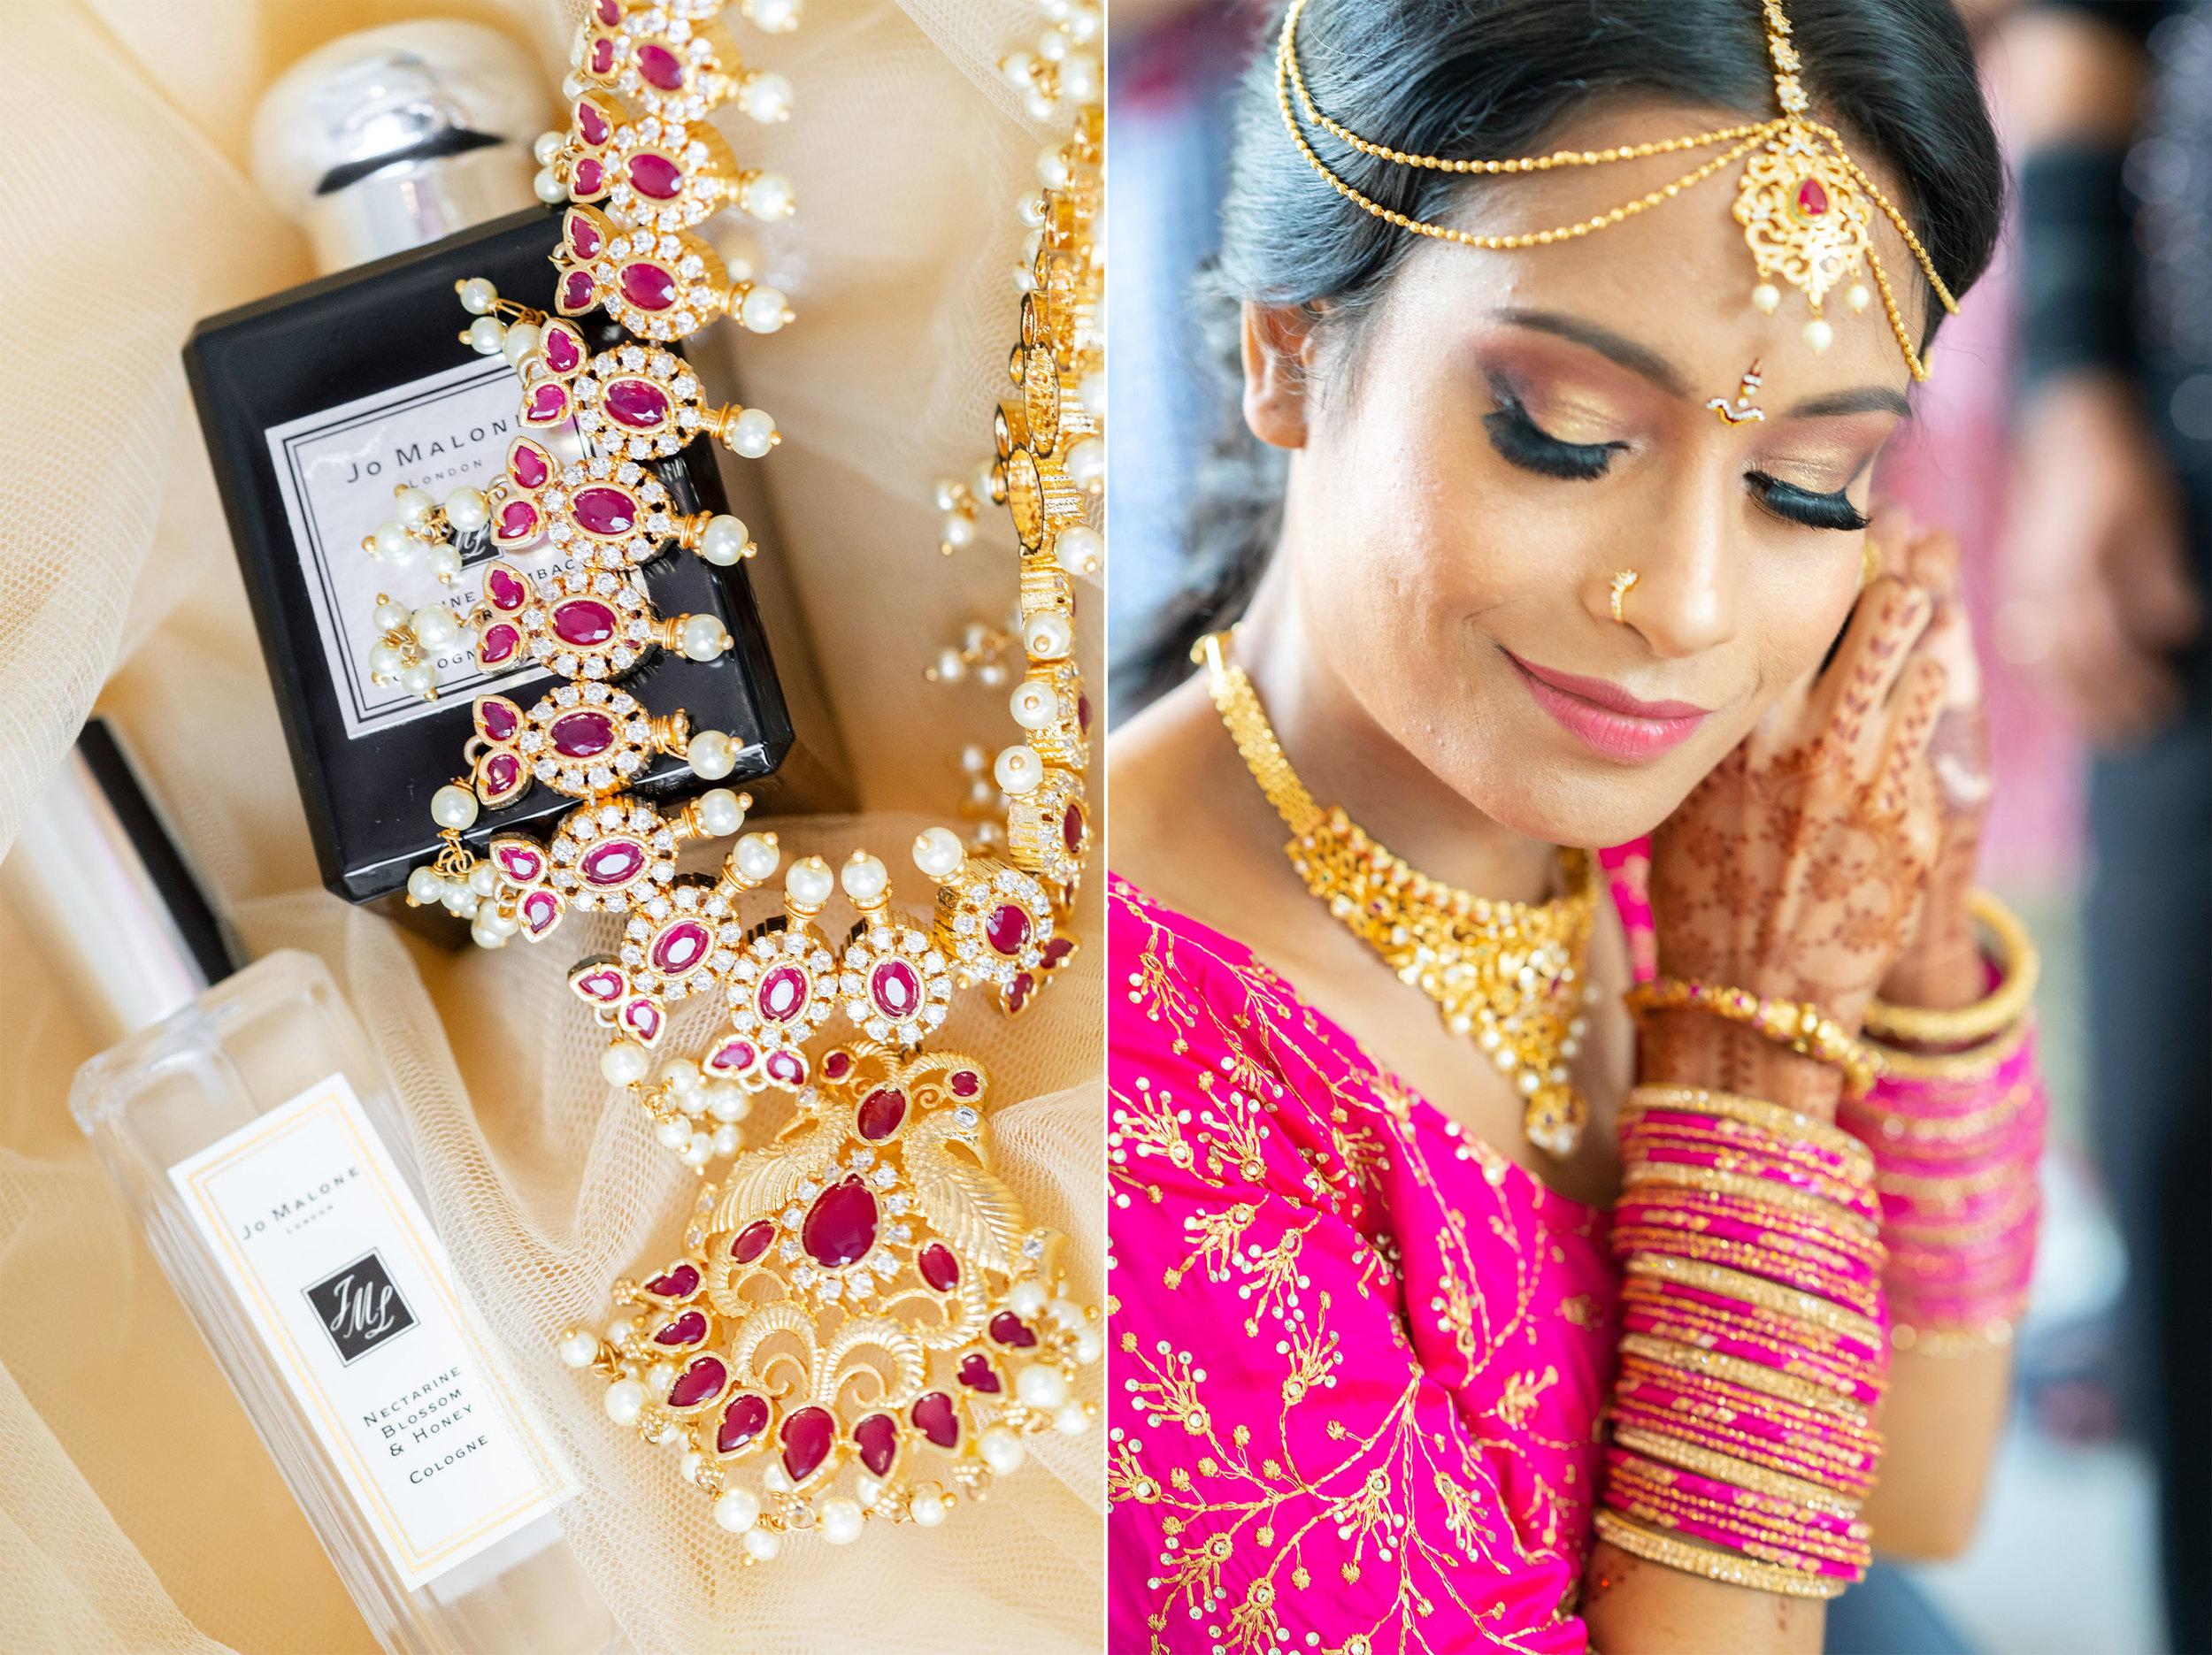 indian wedding detail photos from bethesda north marriott